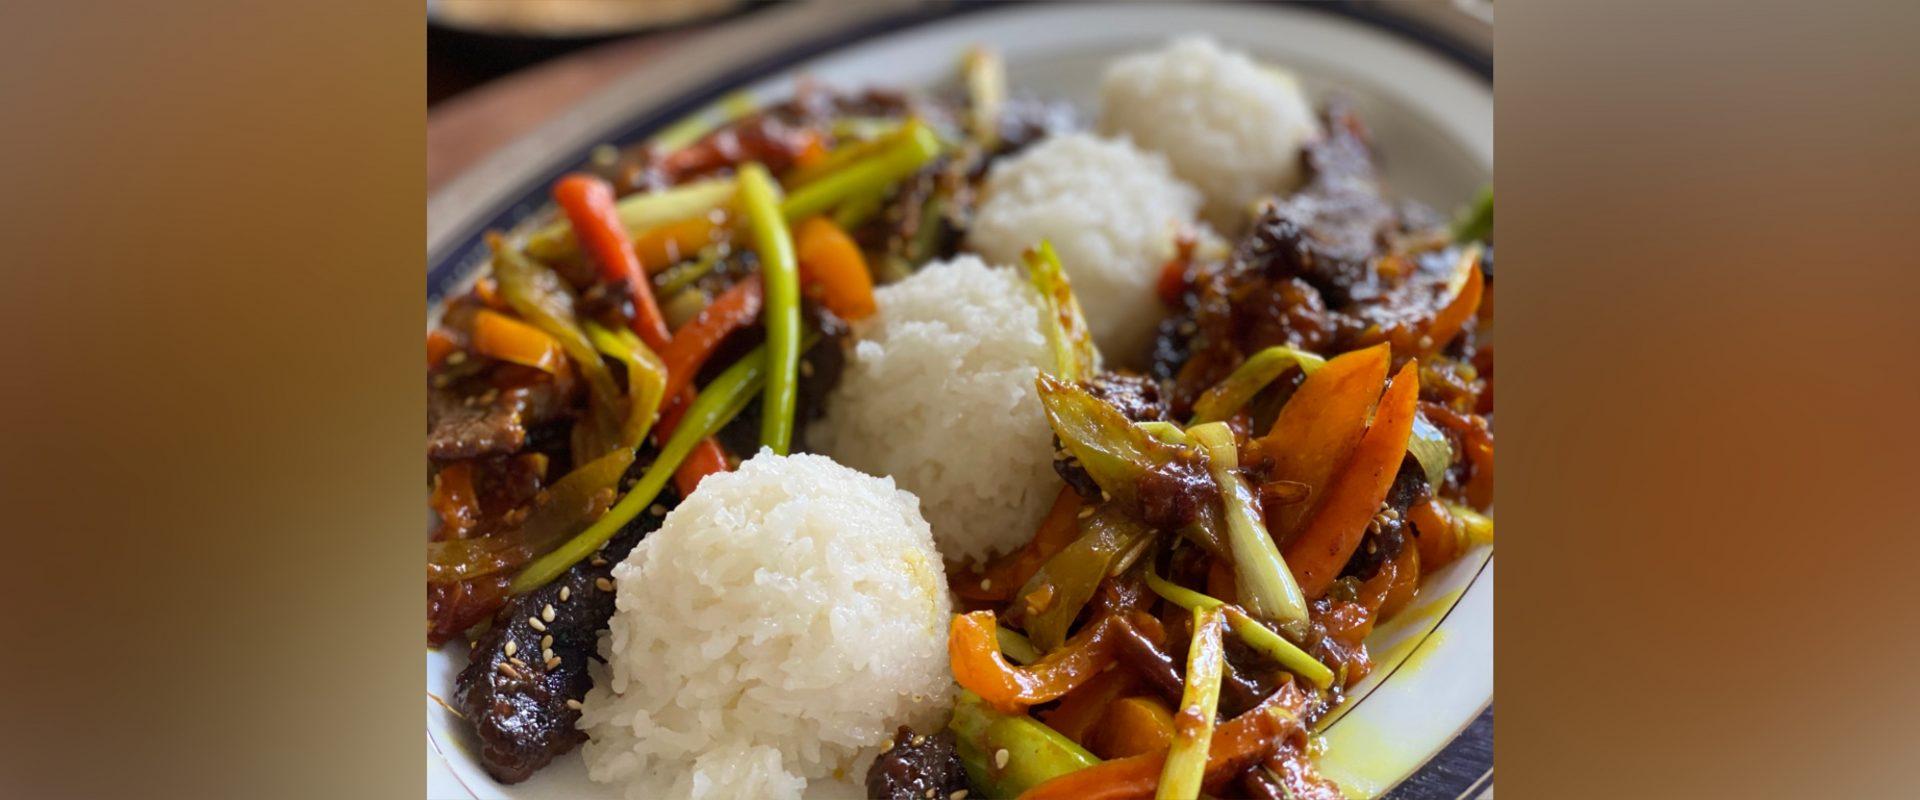 Permalink to: Szechuan Beef